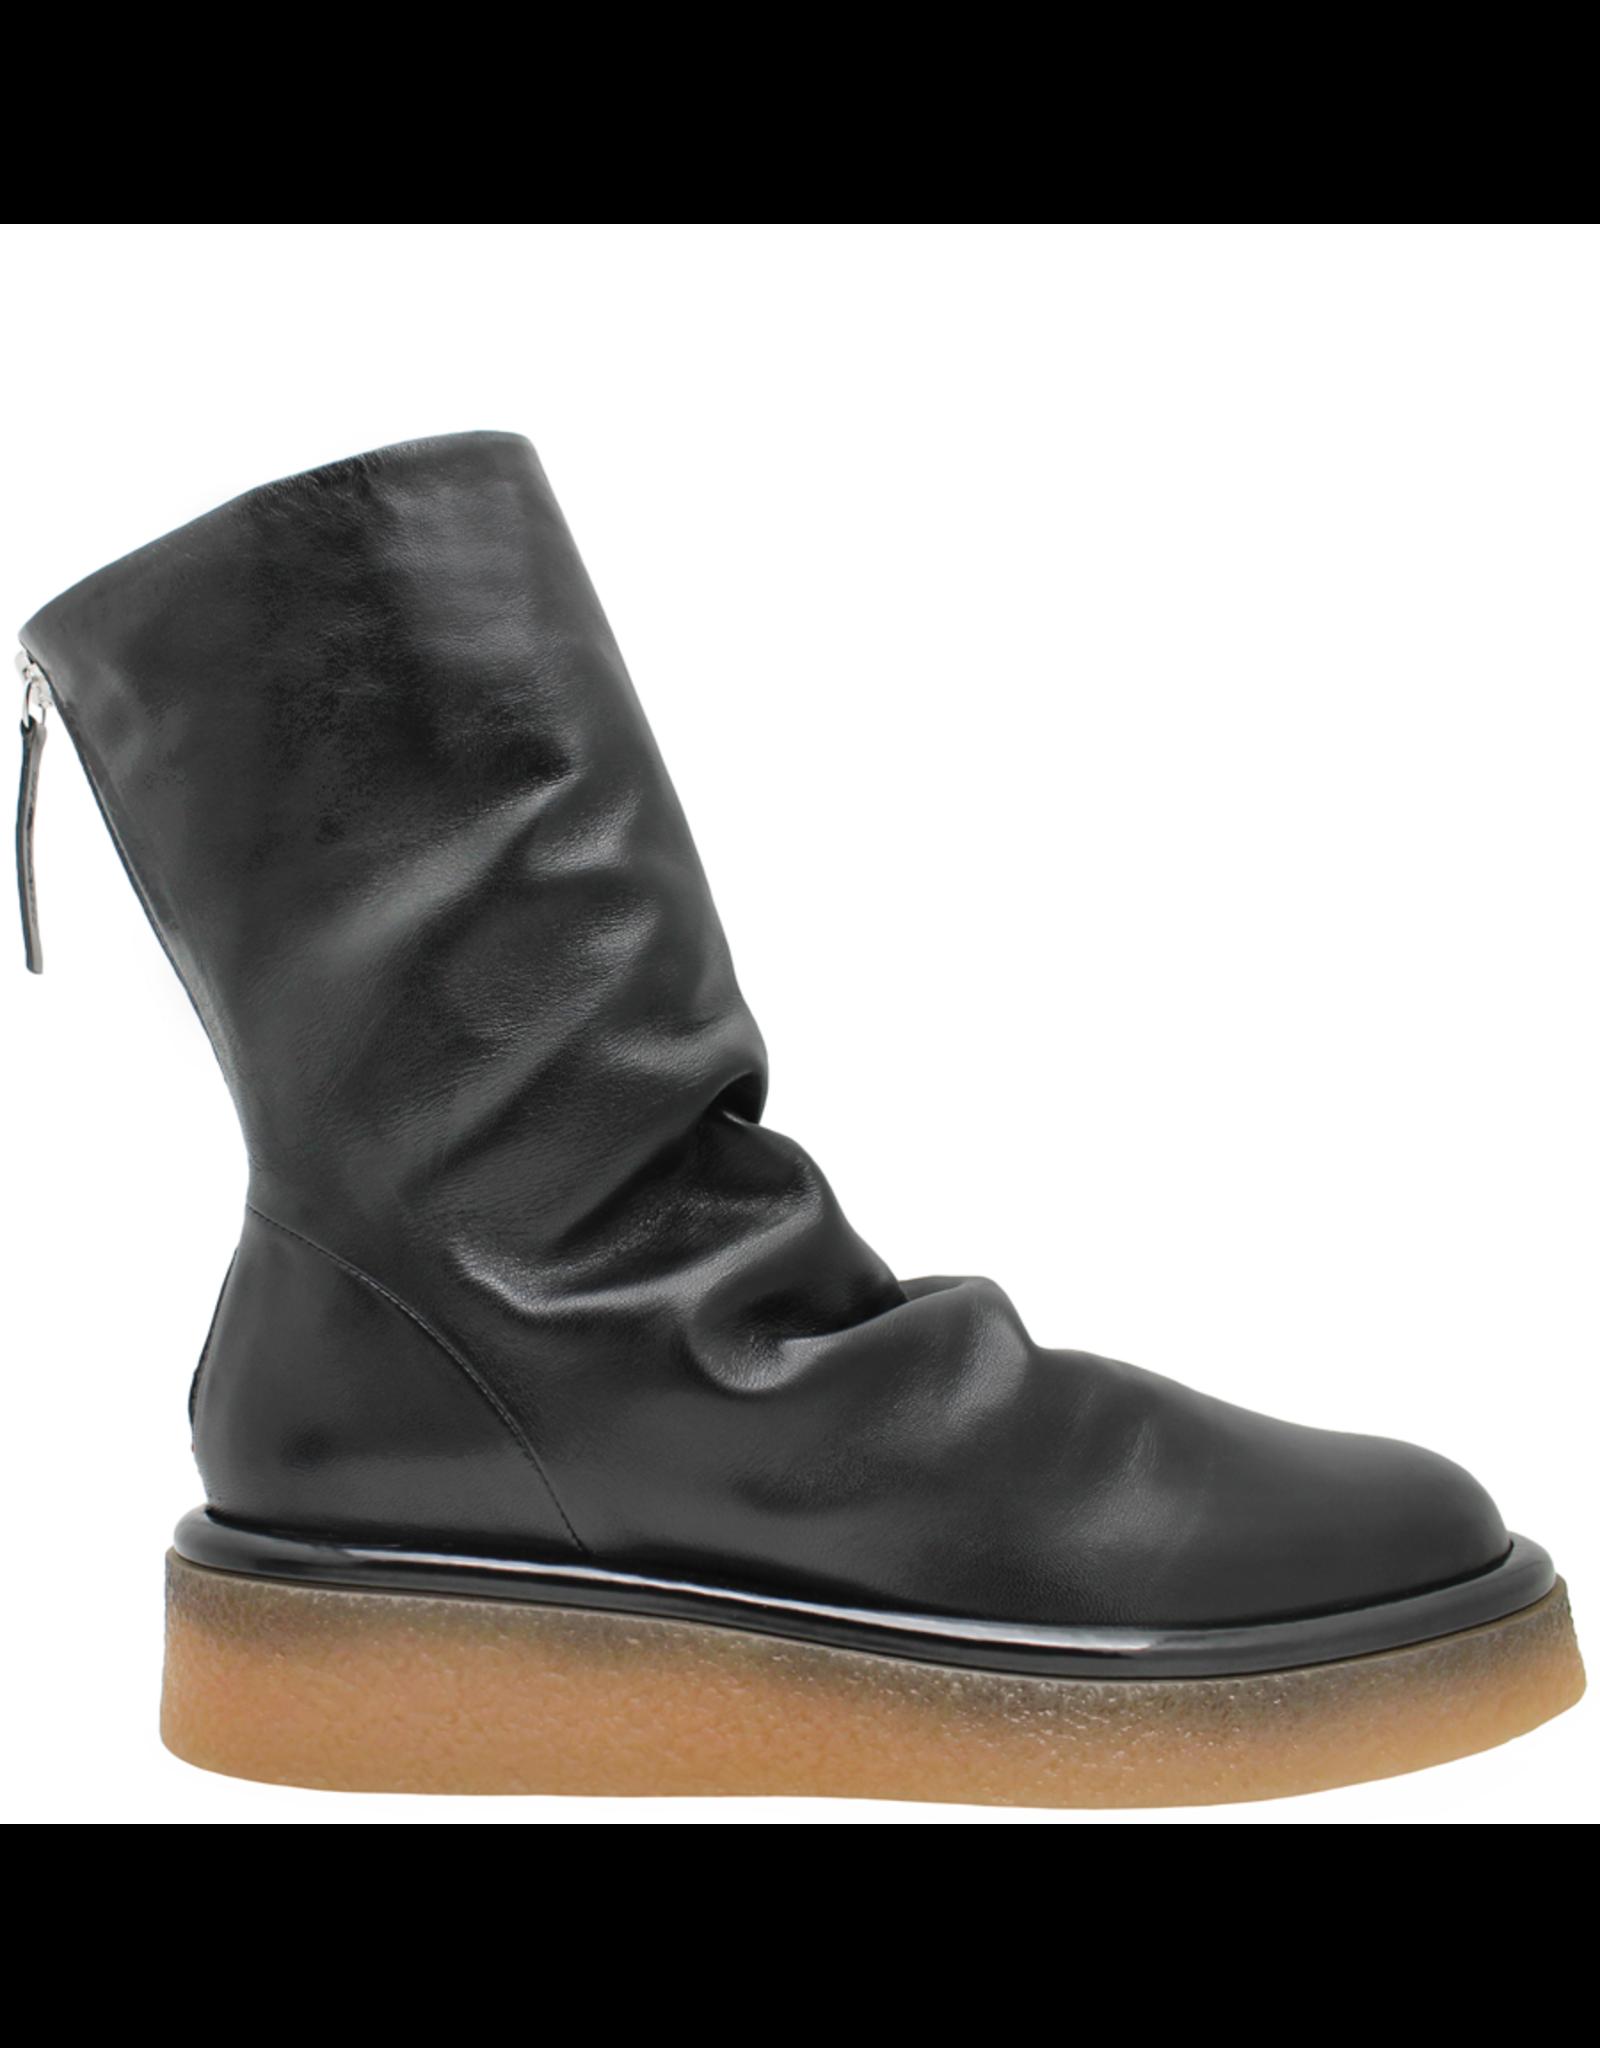 Halmanera Halmanera Black Crepe Sole Boot 2053